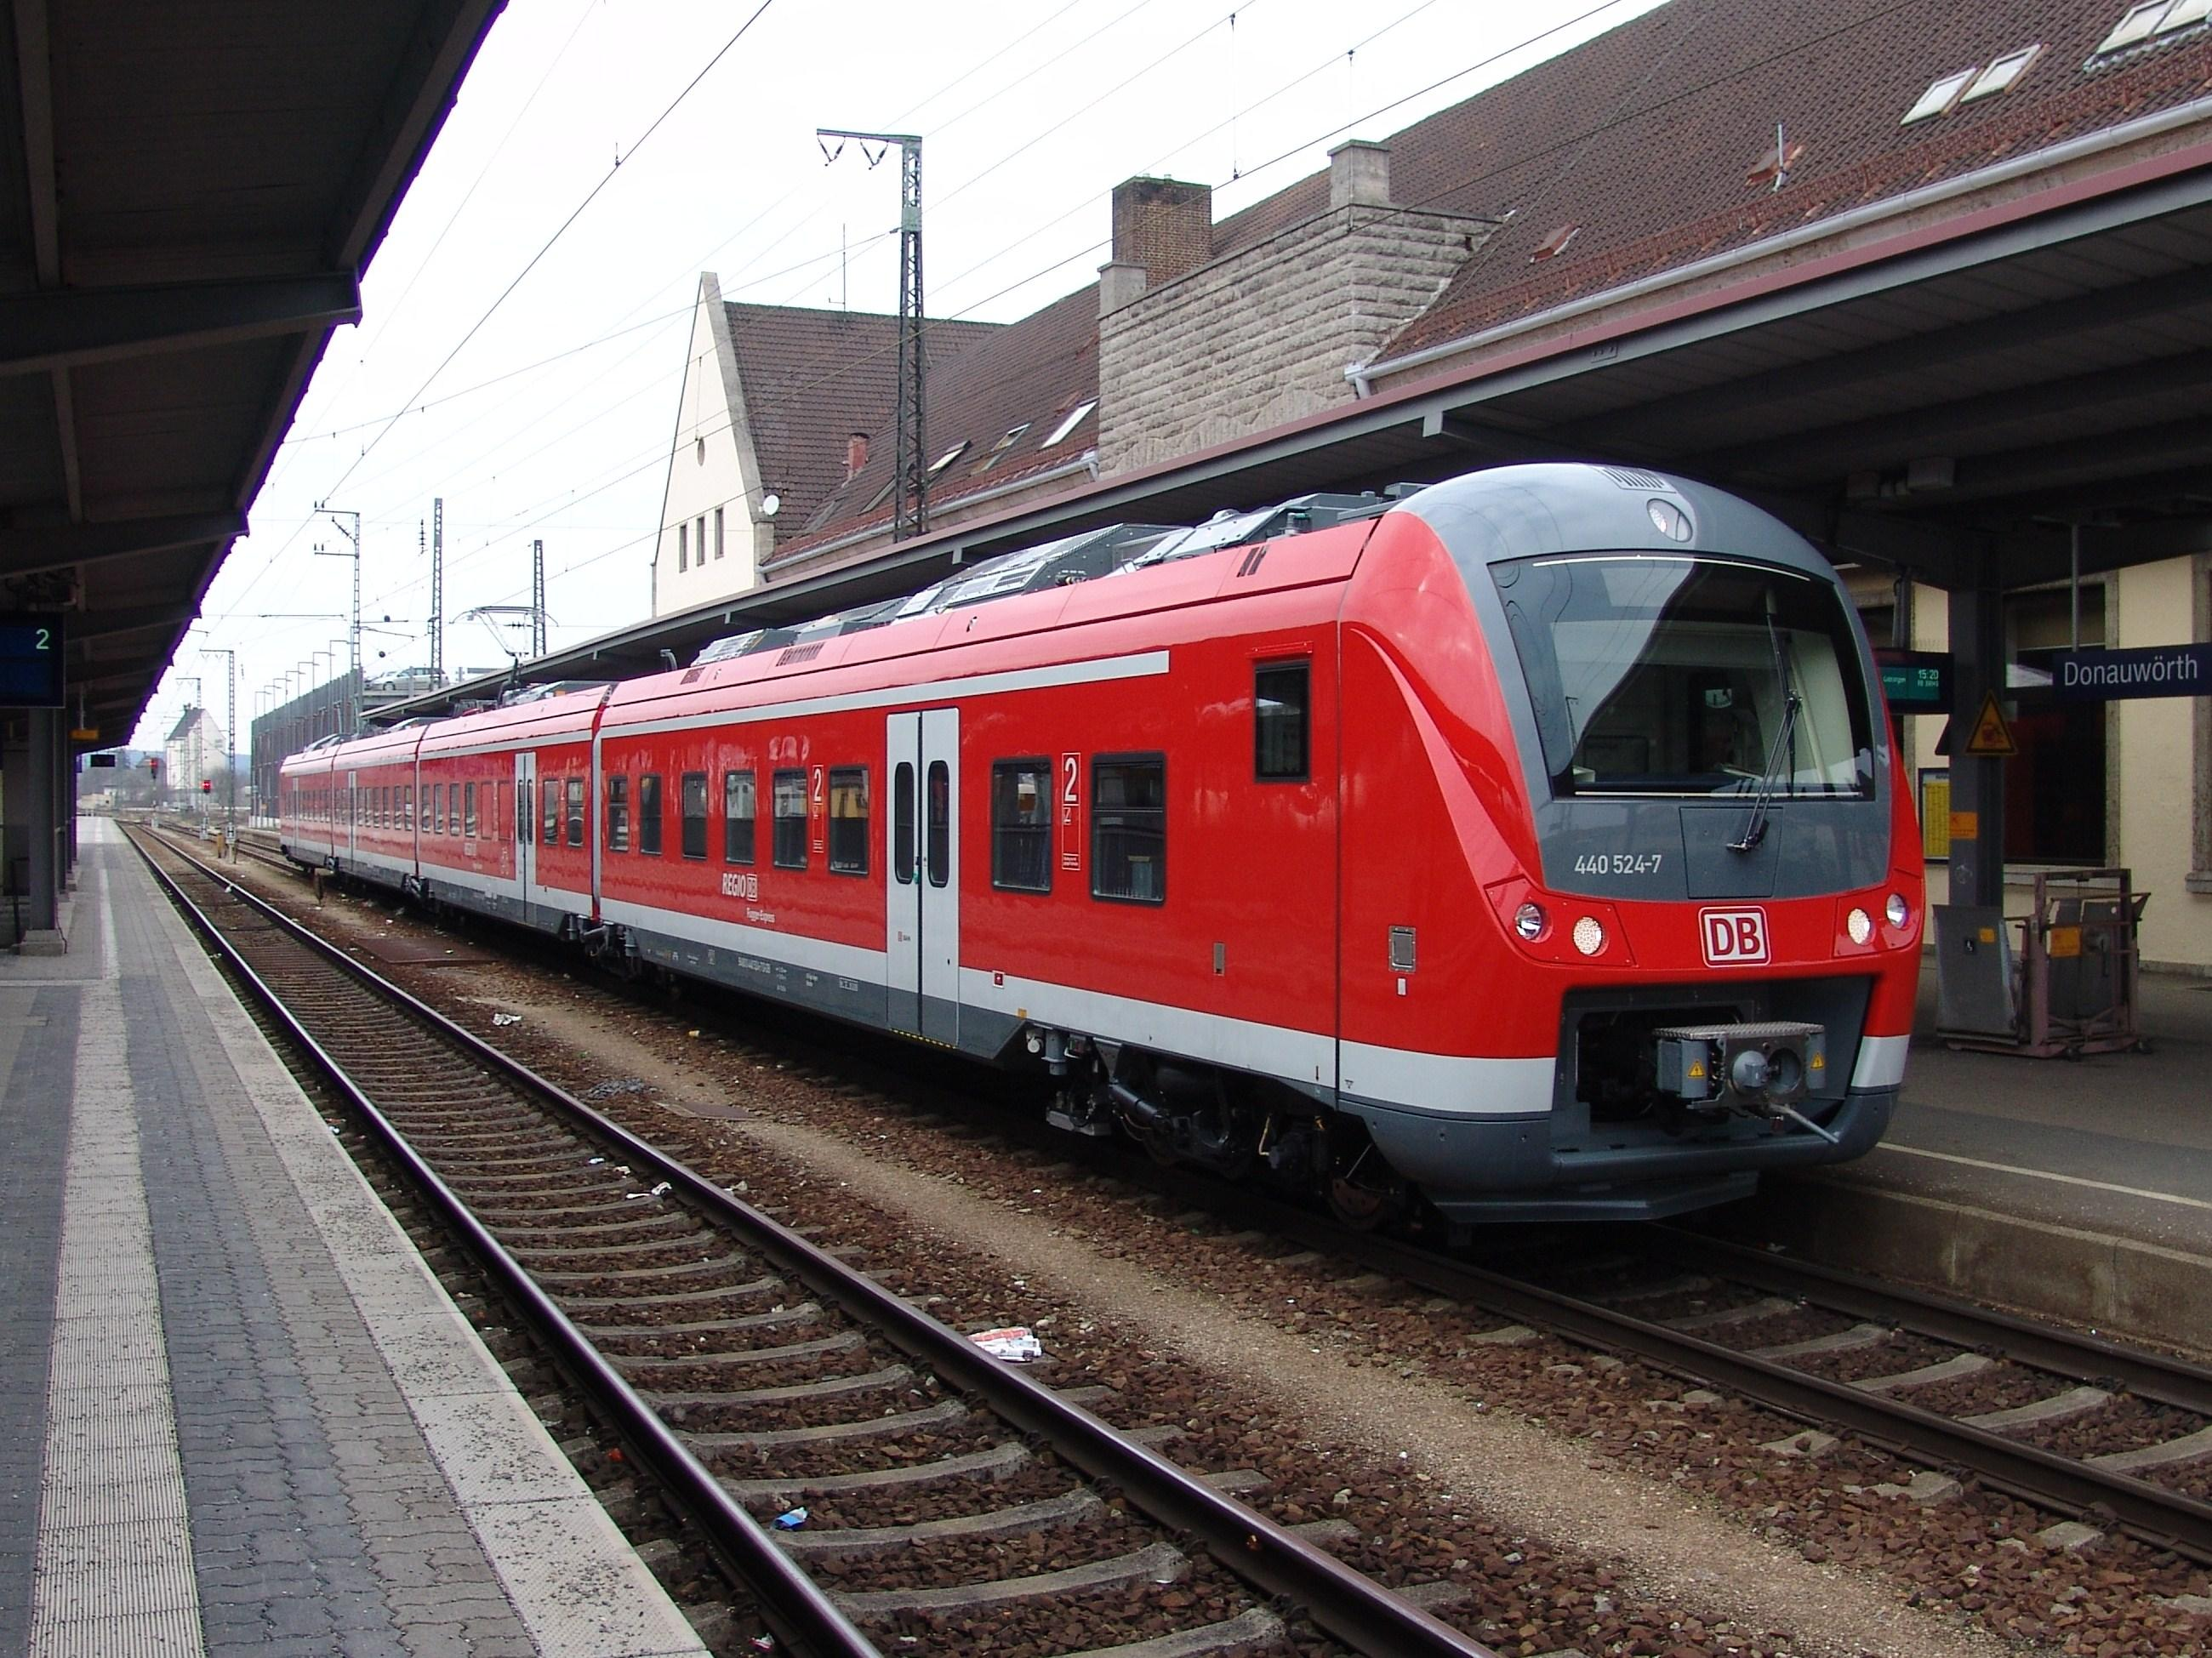 440 024 im Bahnhof Donauwörth